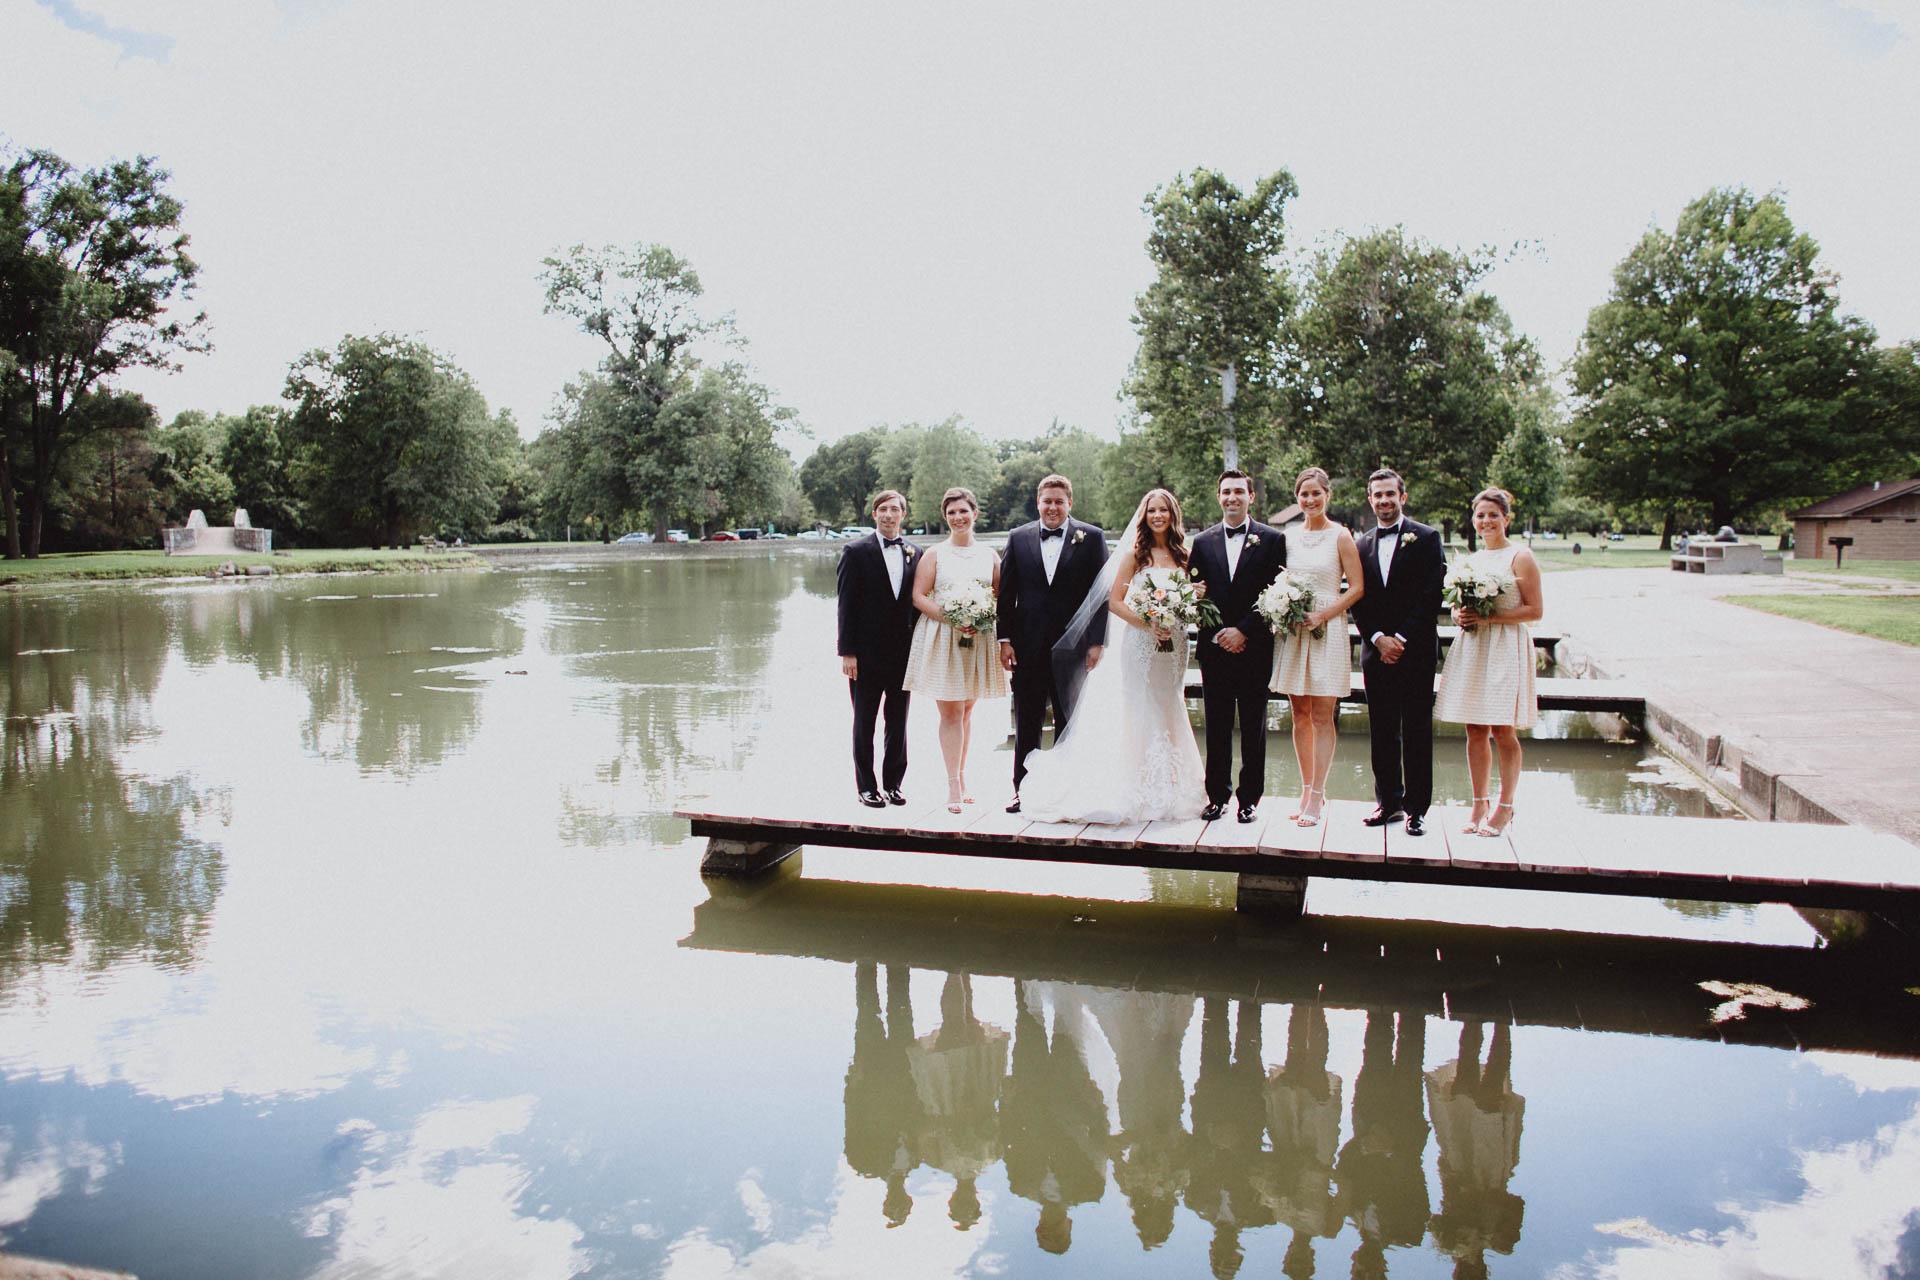 Keri-Joseph-Top-of-the-Market-Wedding-091@2x.jpg